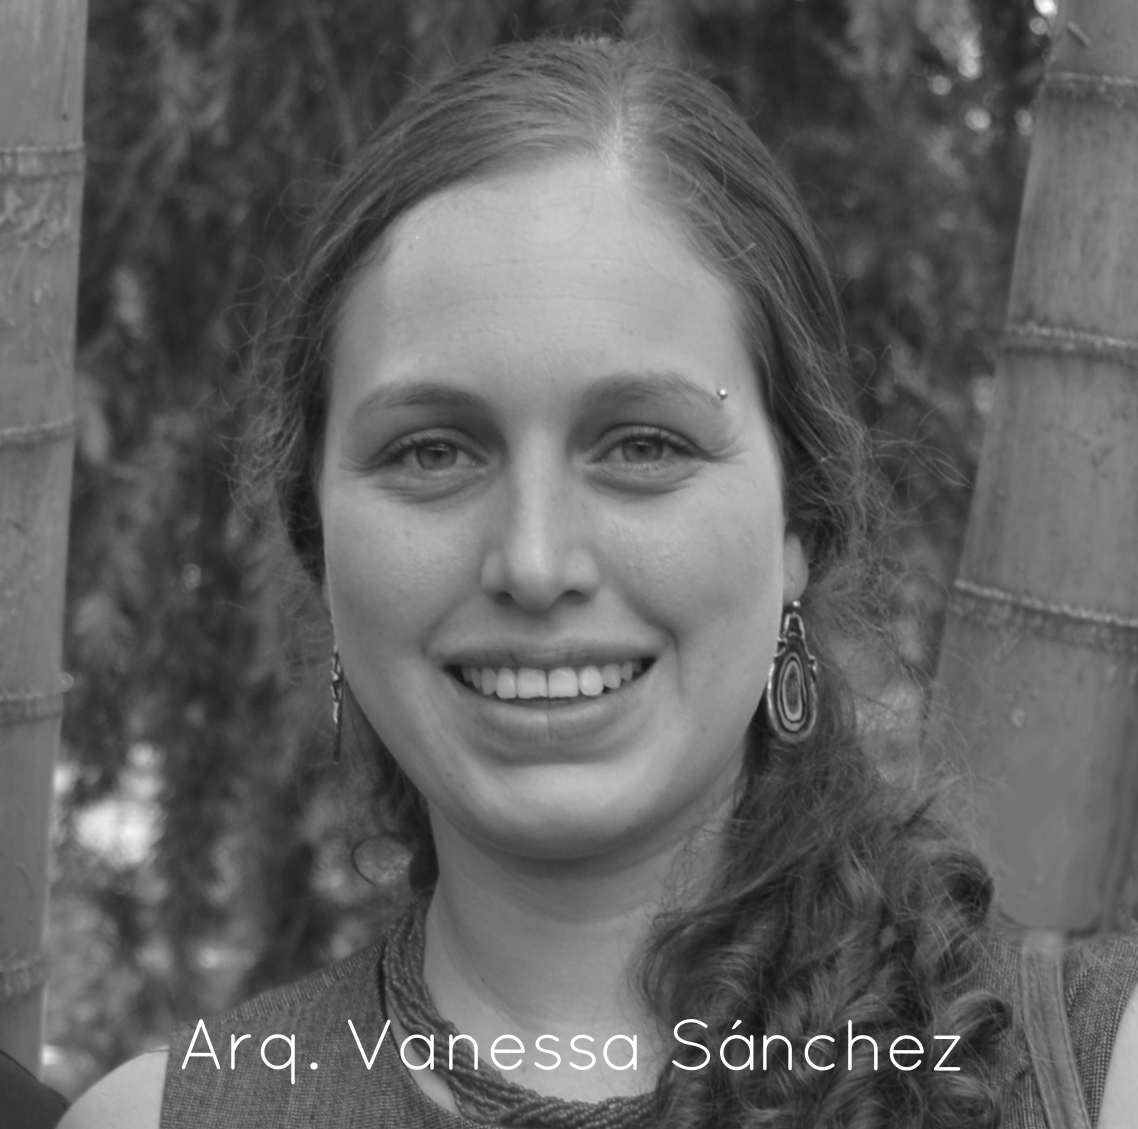 Arq. Vanessa Sánchez Naranjo